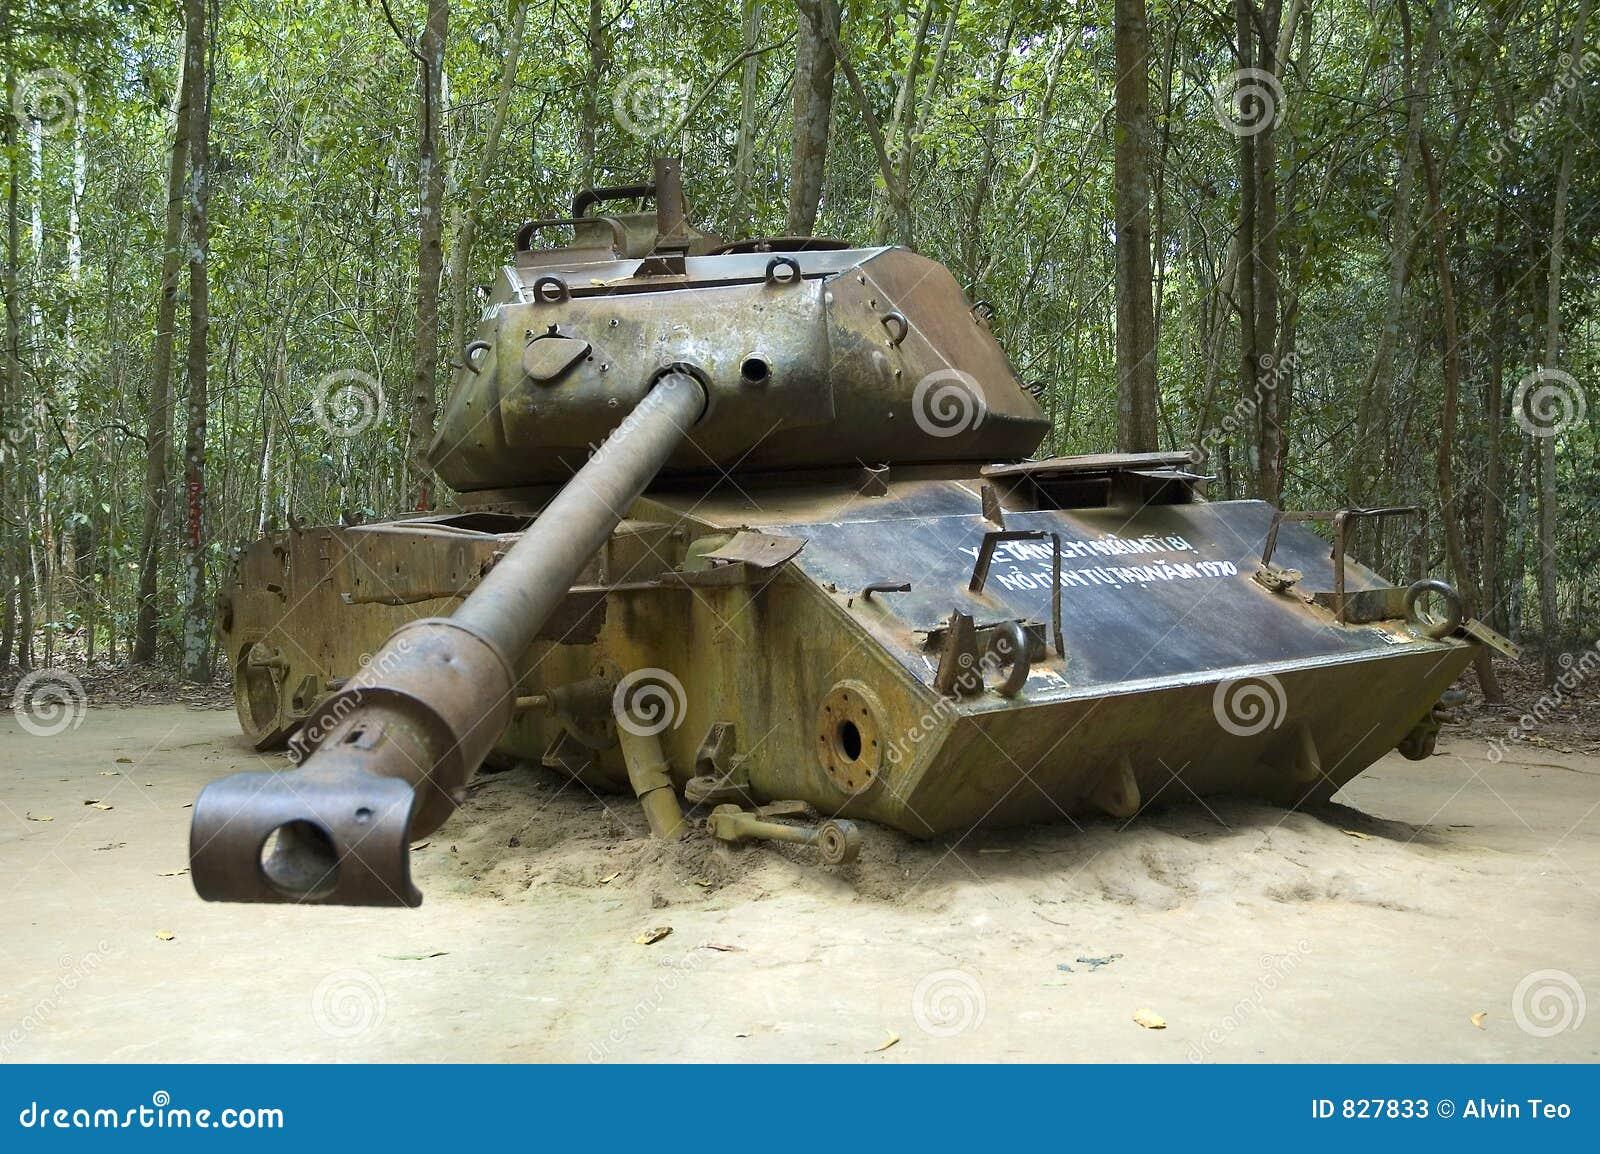 American tank destroyed during Vietnam War